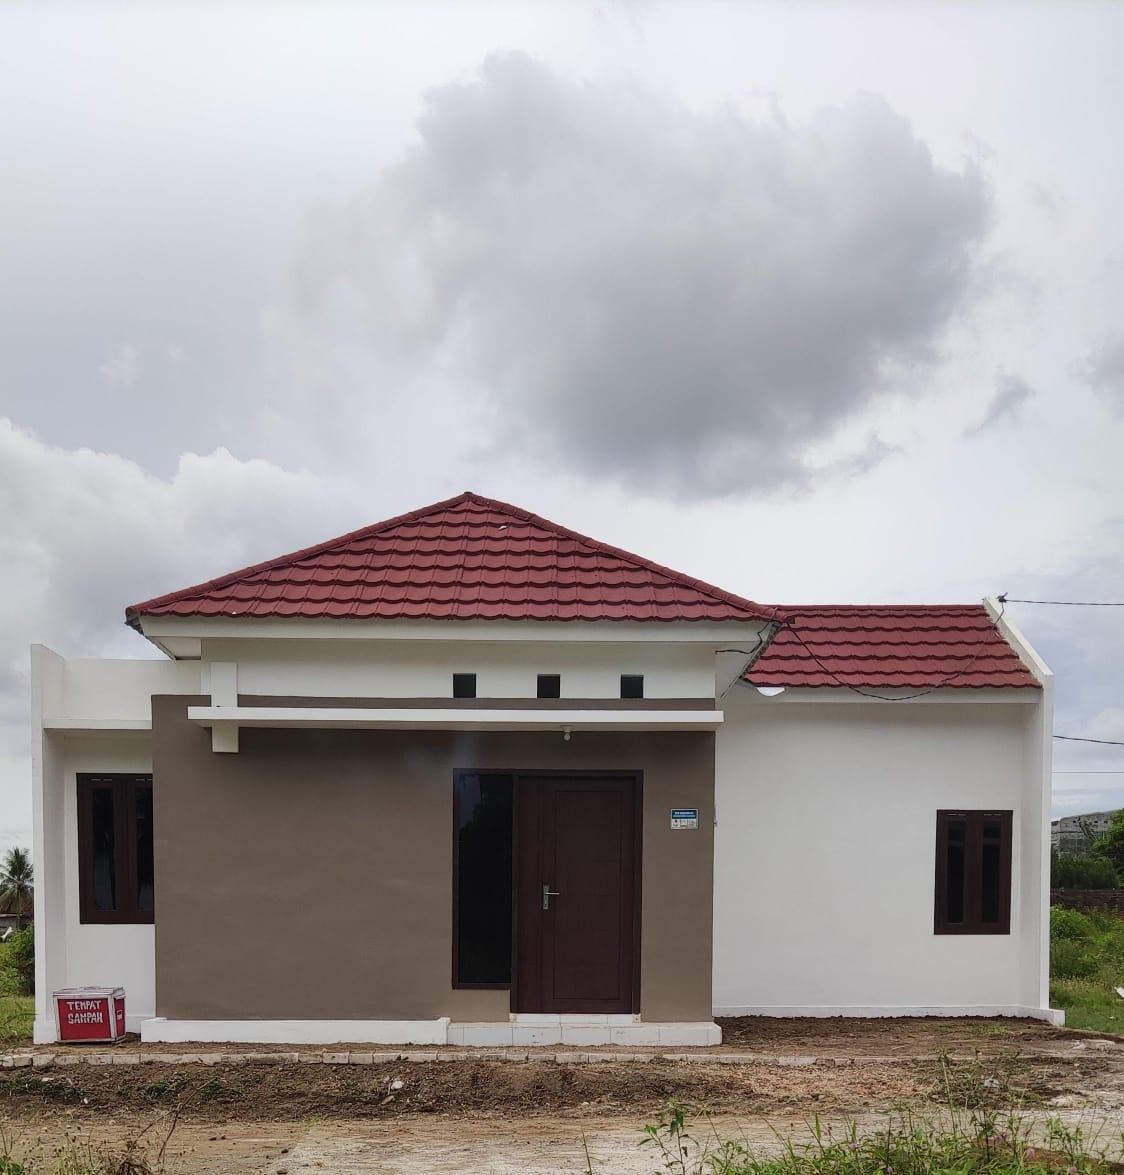 rumah murah banyuwangi, Dijual rumah di Banyuwangi, property banyuwangi